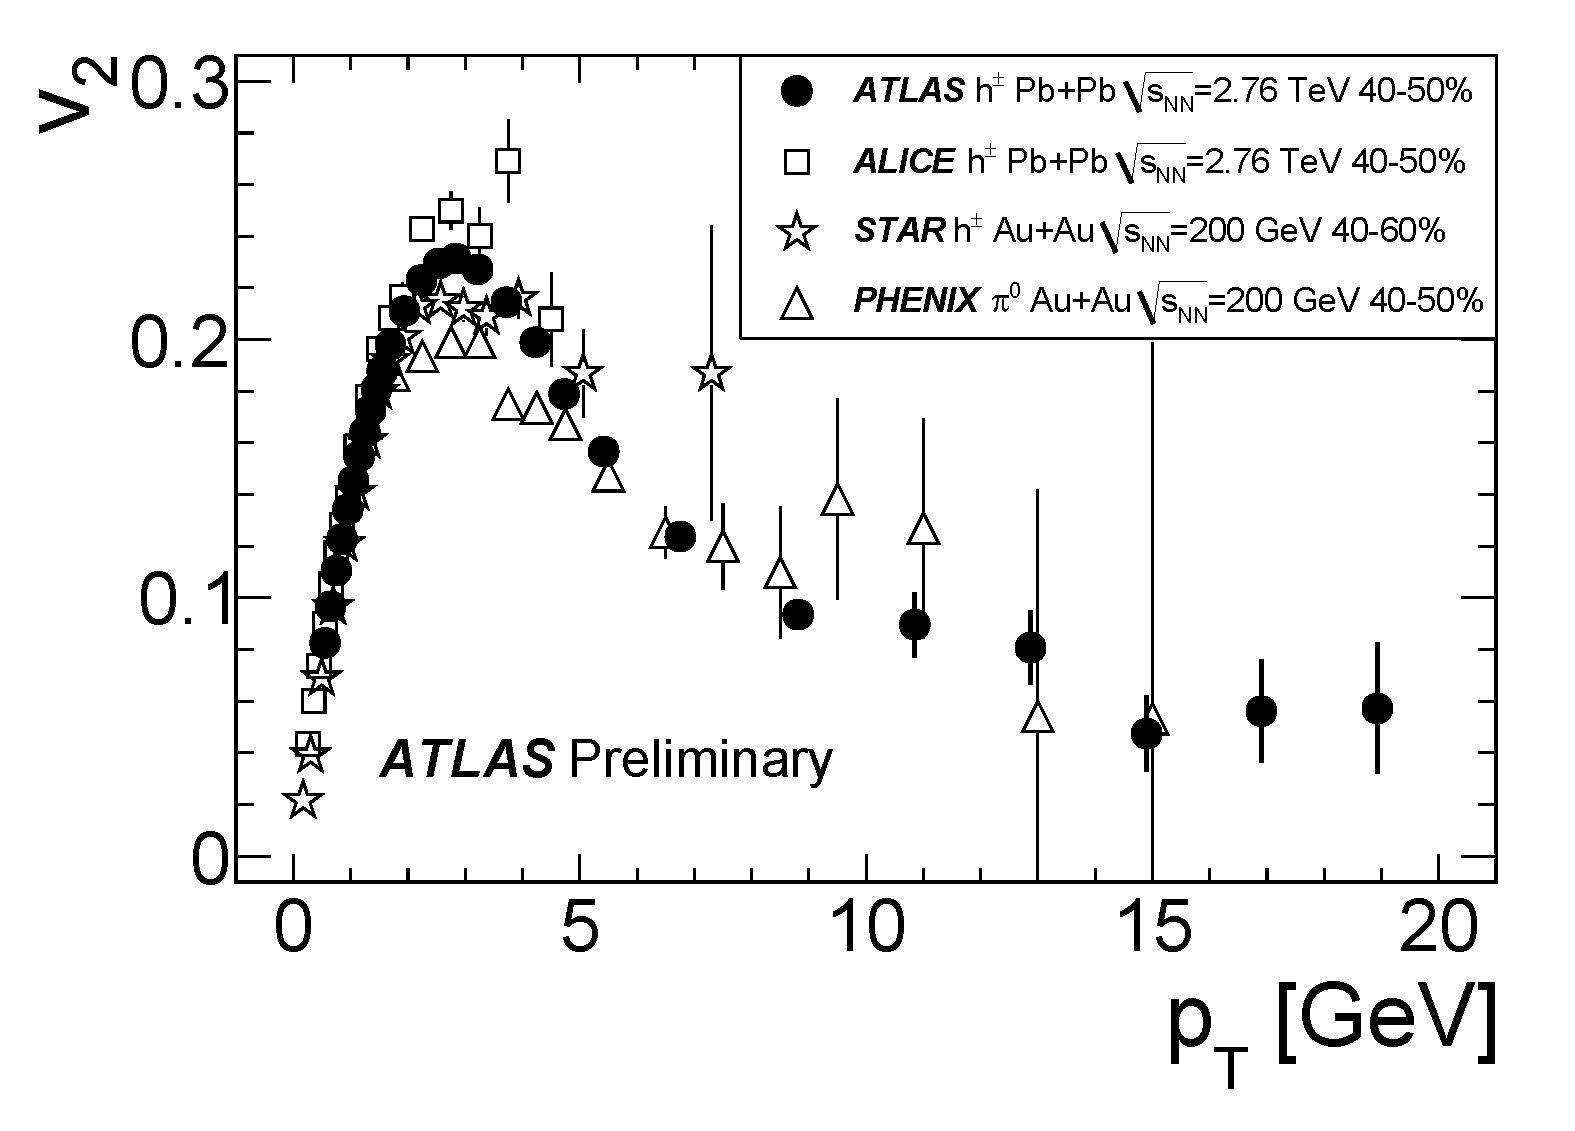 https://twiki.cern.ch/twiki/pub/AtlasPublic/QM2011EllipticFlowResults/v2_vs_pt_atlas_all_4050.png